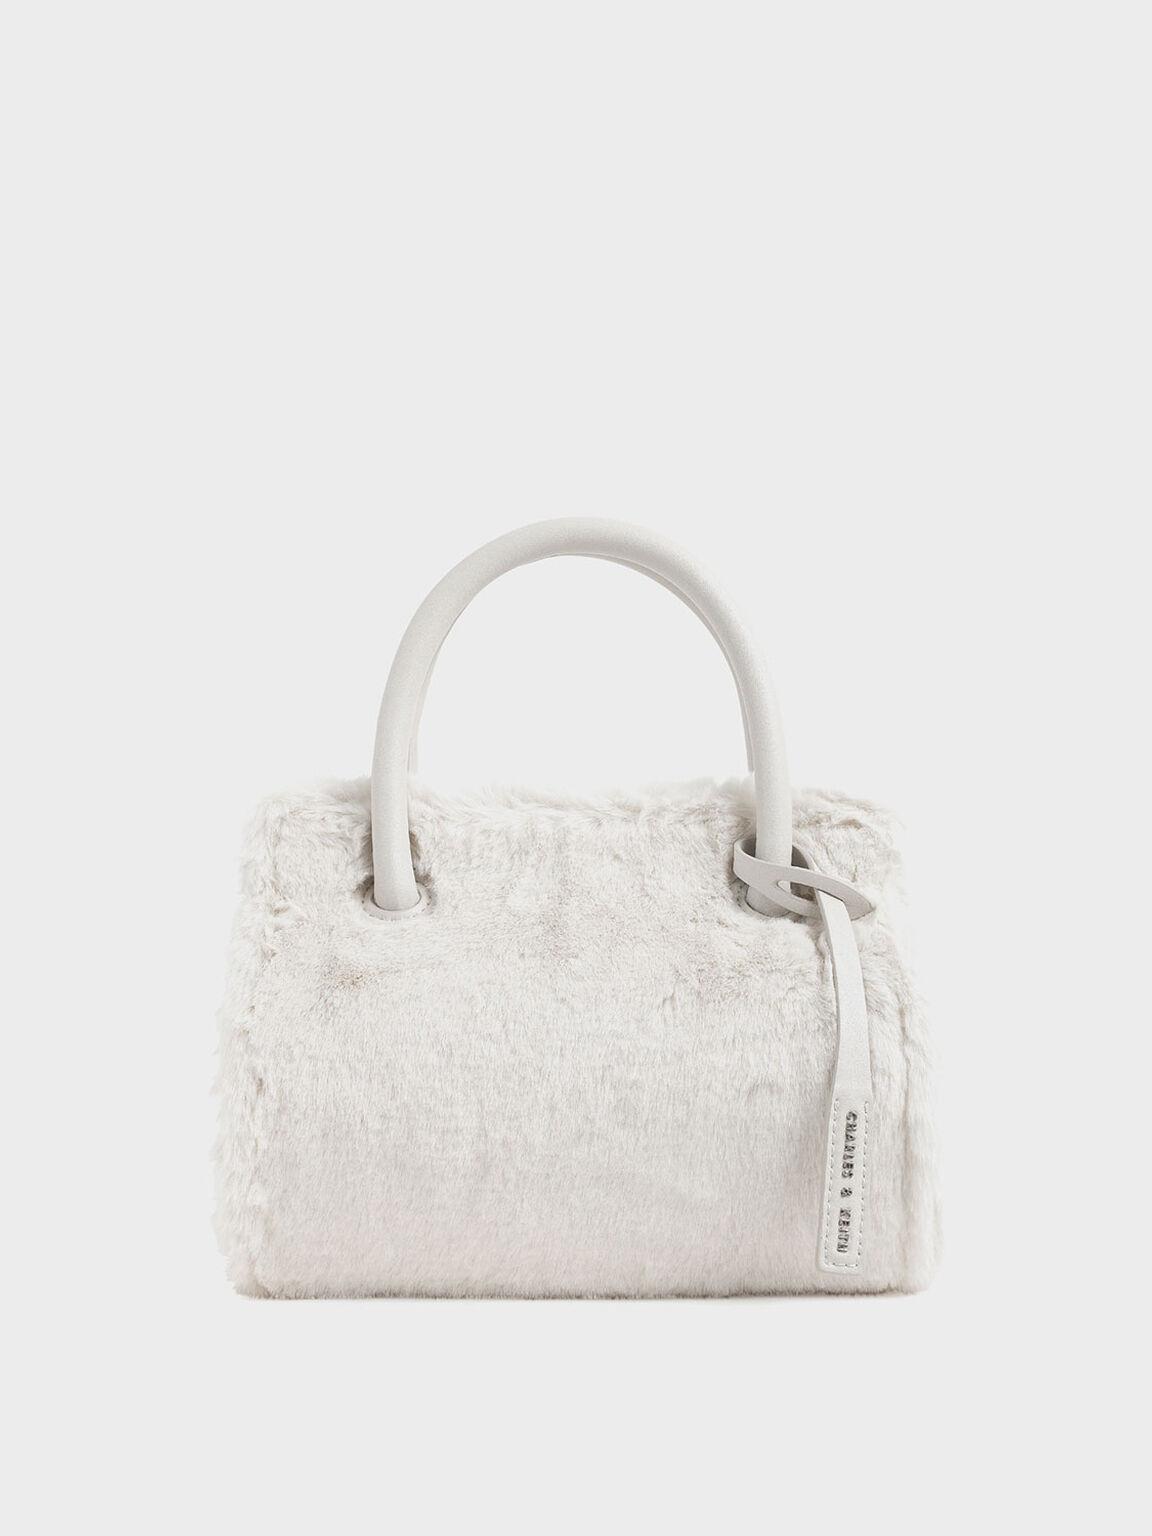 Textured Double Top Handle Bag, Cream, hi-res